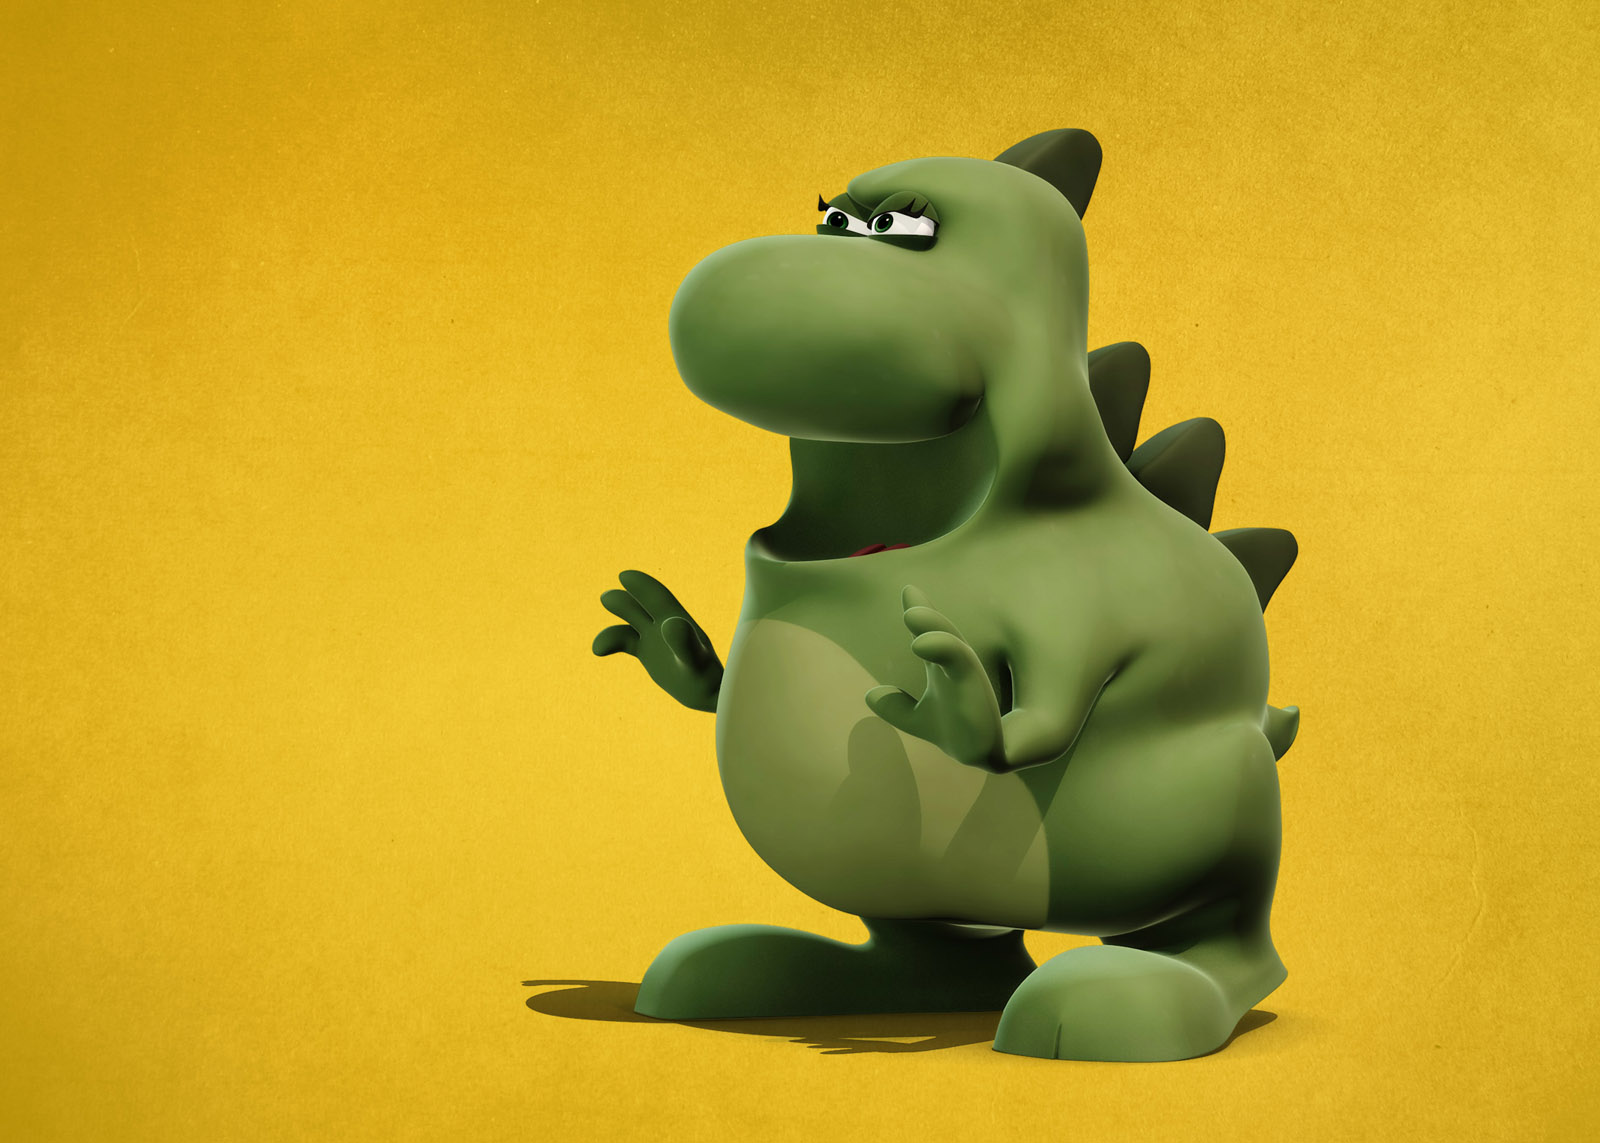 Tiny dinosaur 3d cartoon